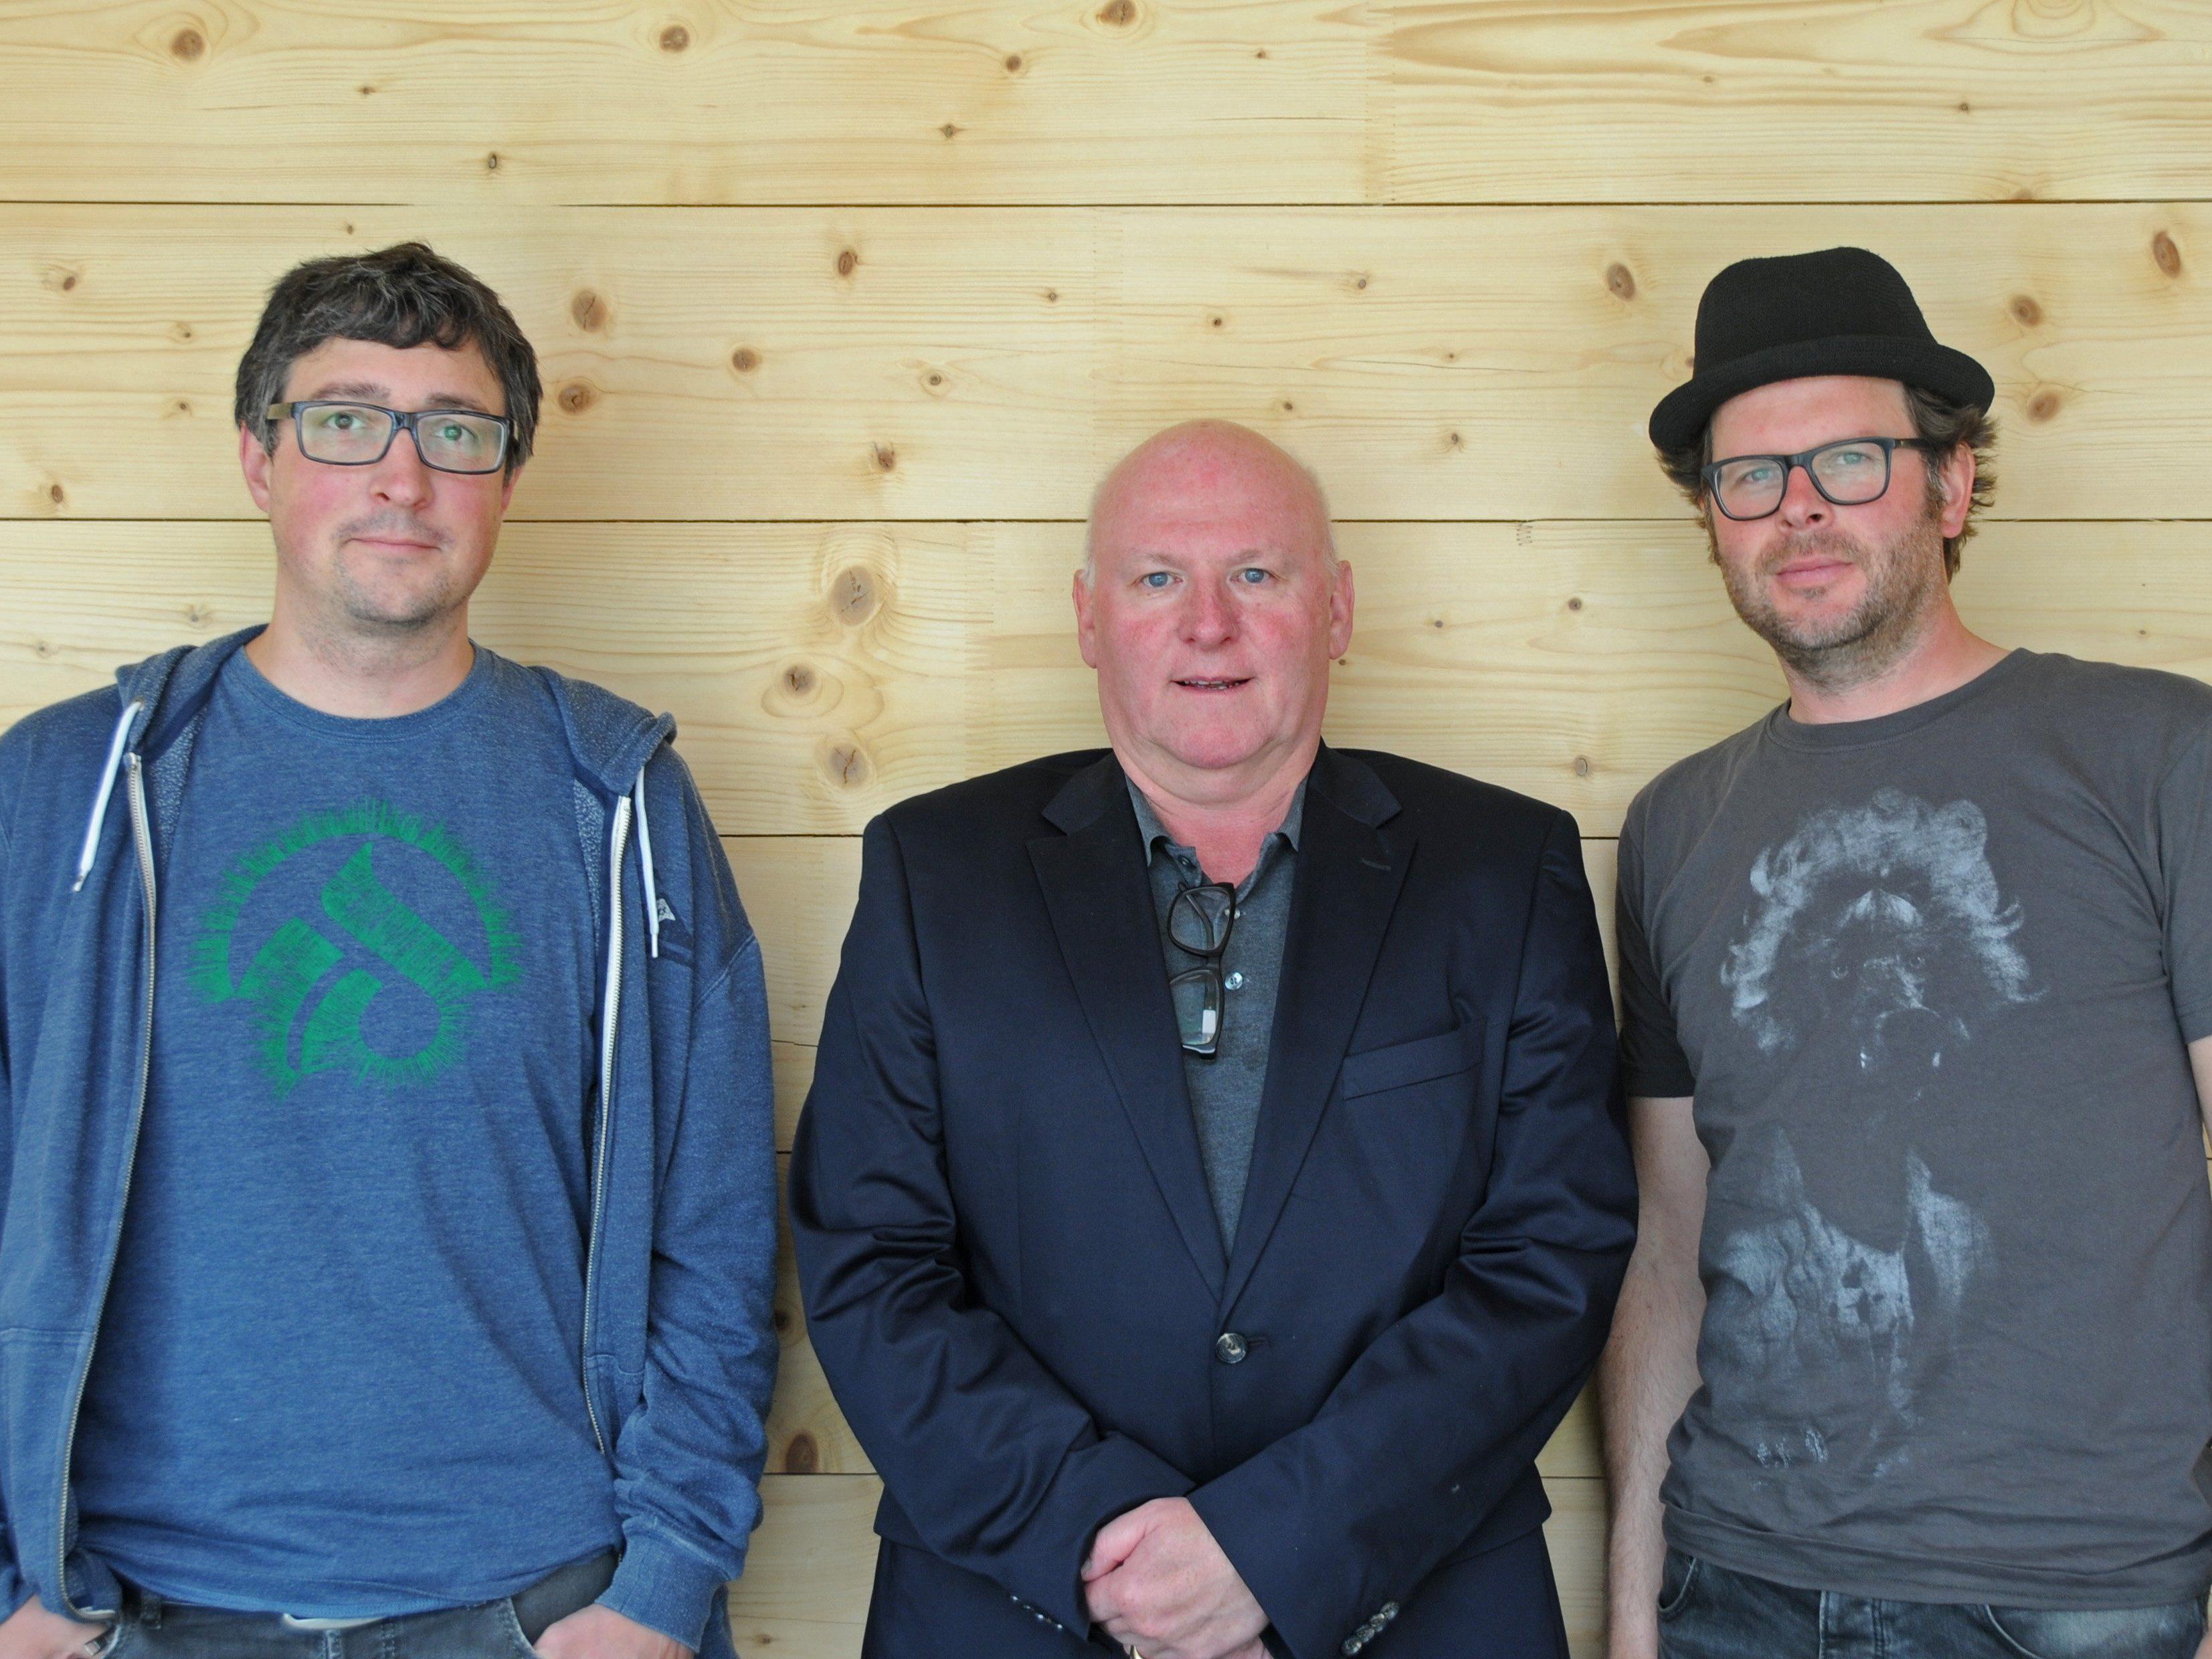 Die drei Kuratoren des Dornbirner Origano-Festivals: Hannes Hagen (Conrad Sohm), Roland Jörg (Kultur Stadt Dornbirn) und Peter Hörburger (Conrad Sohm)